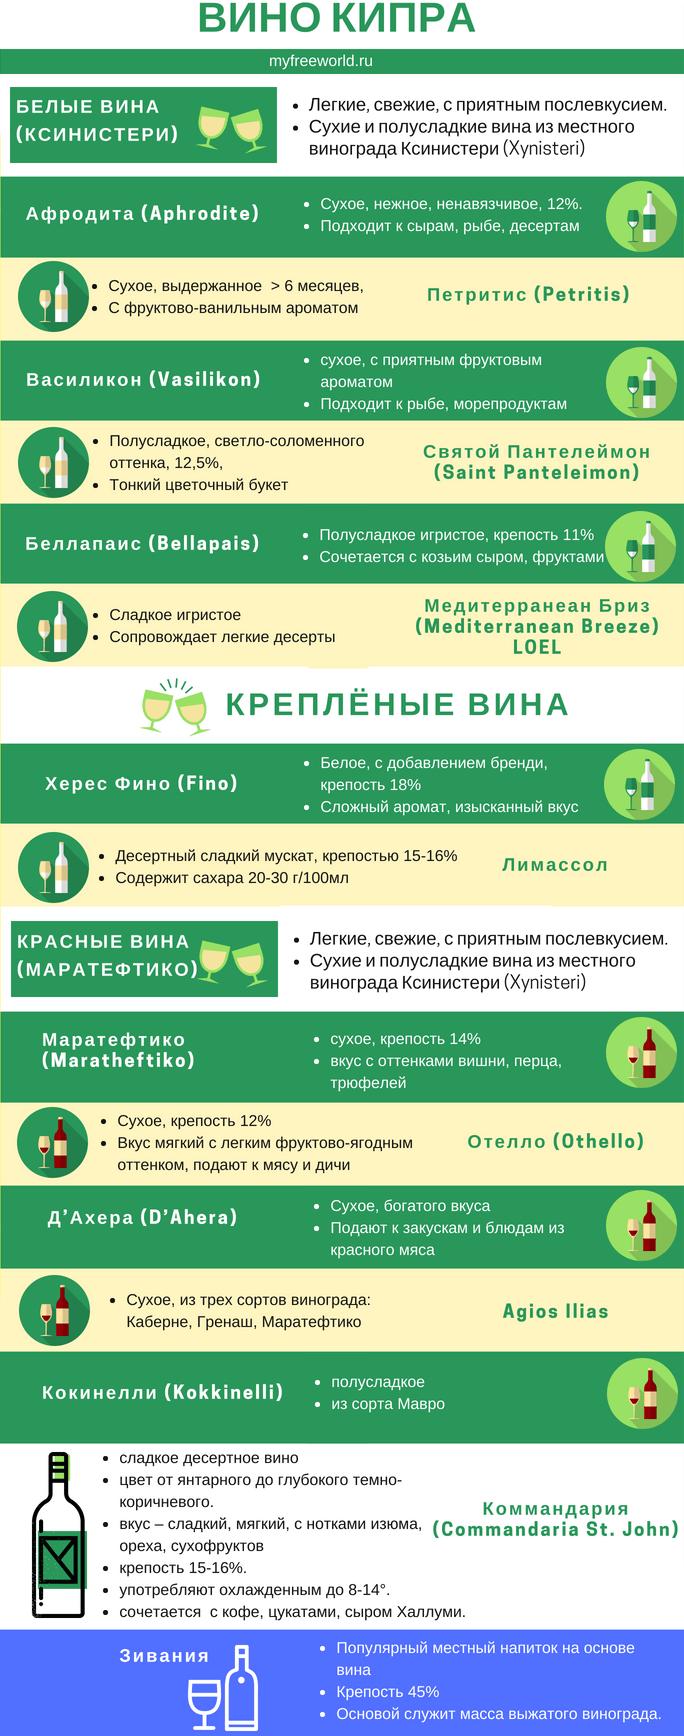 Инфографика вина Кипра